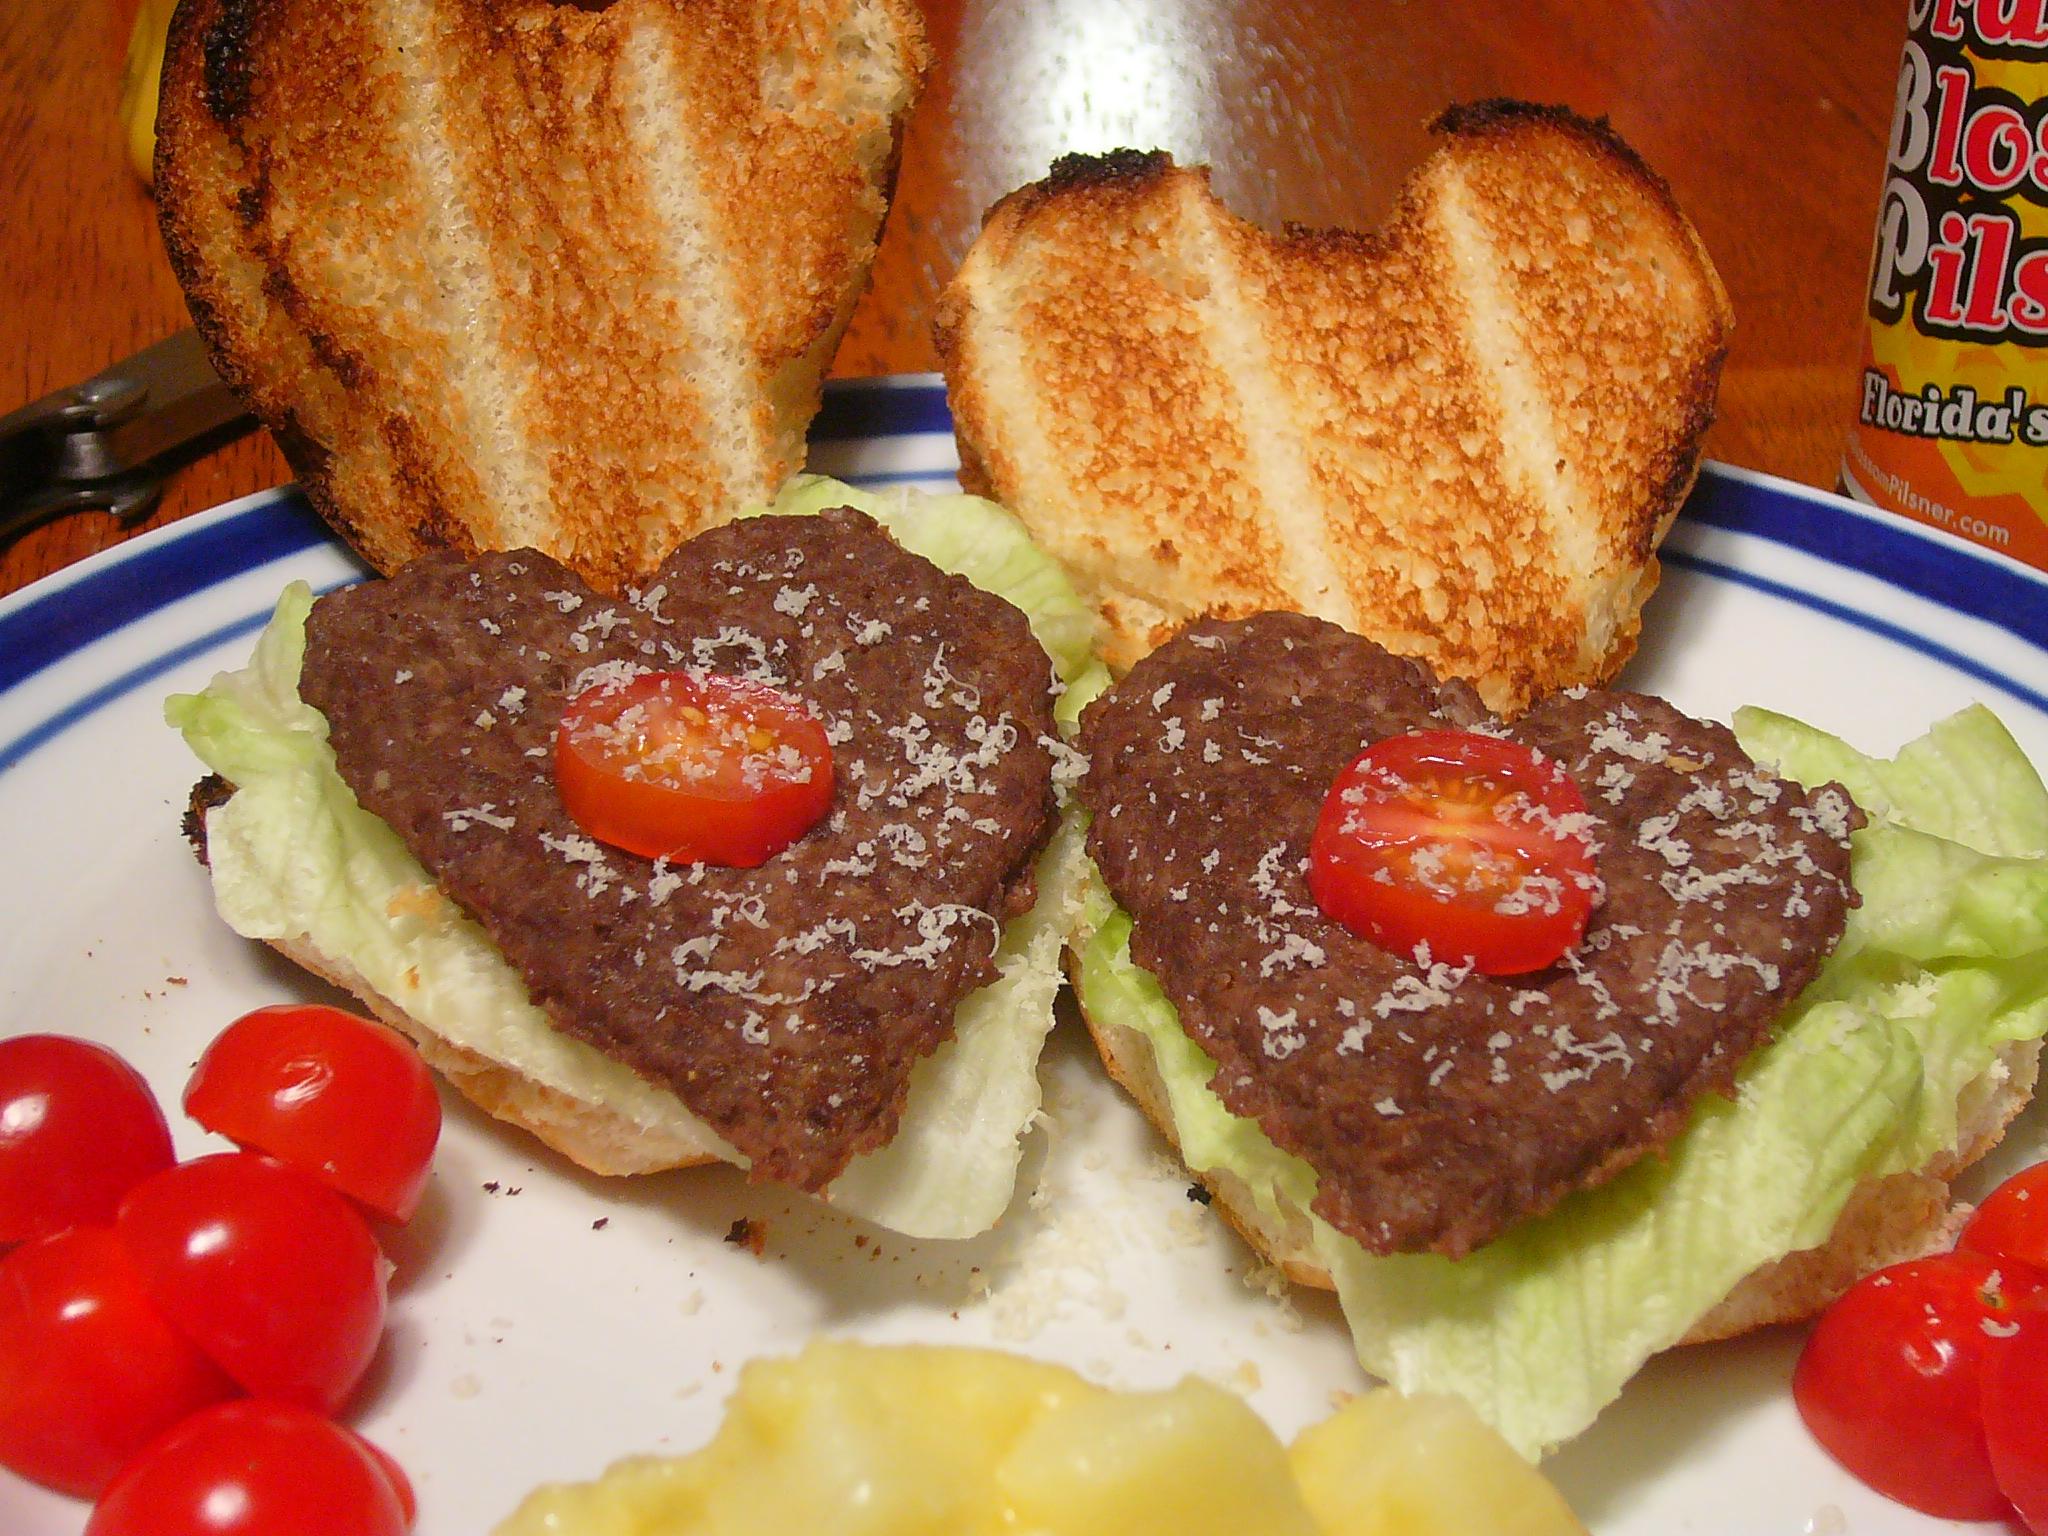 [Collegiate Meals] I Love You (Virus) Burgers